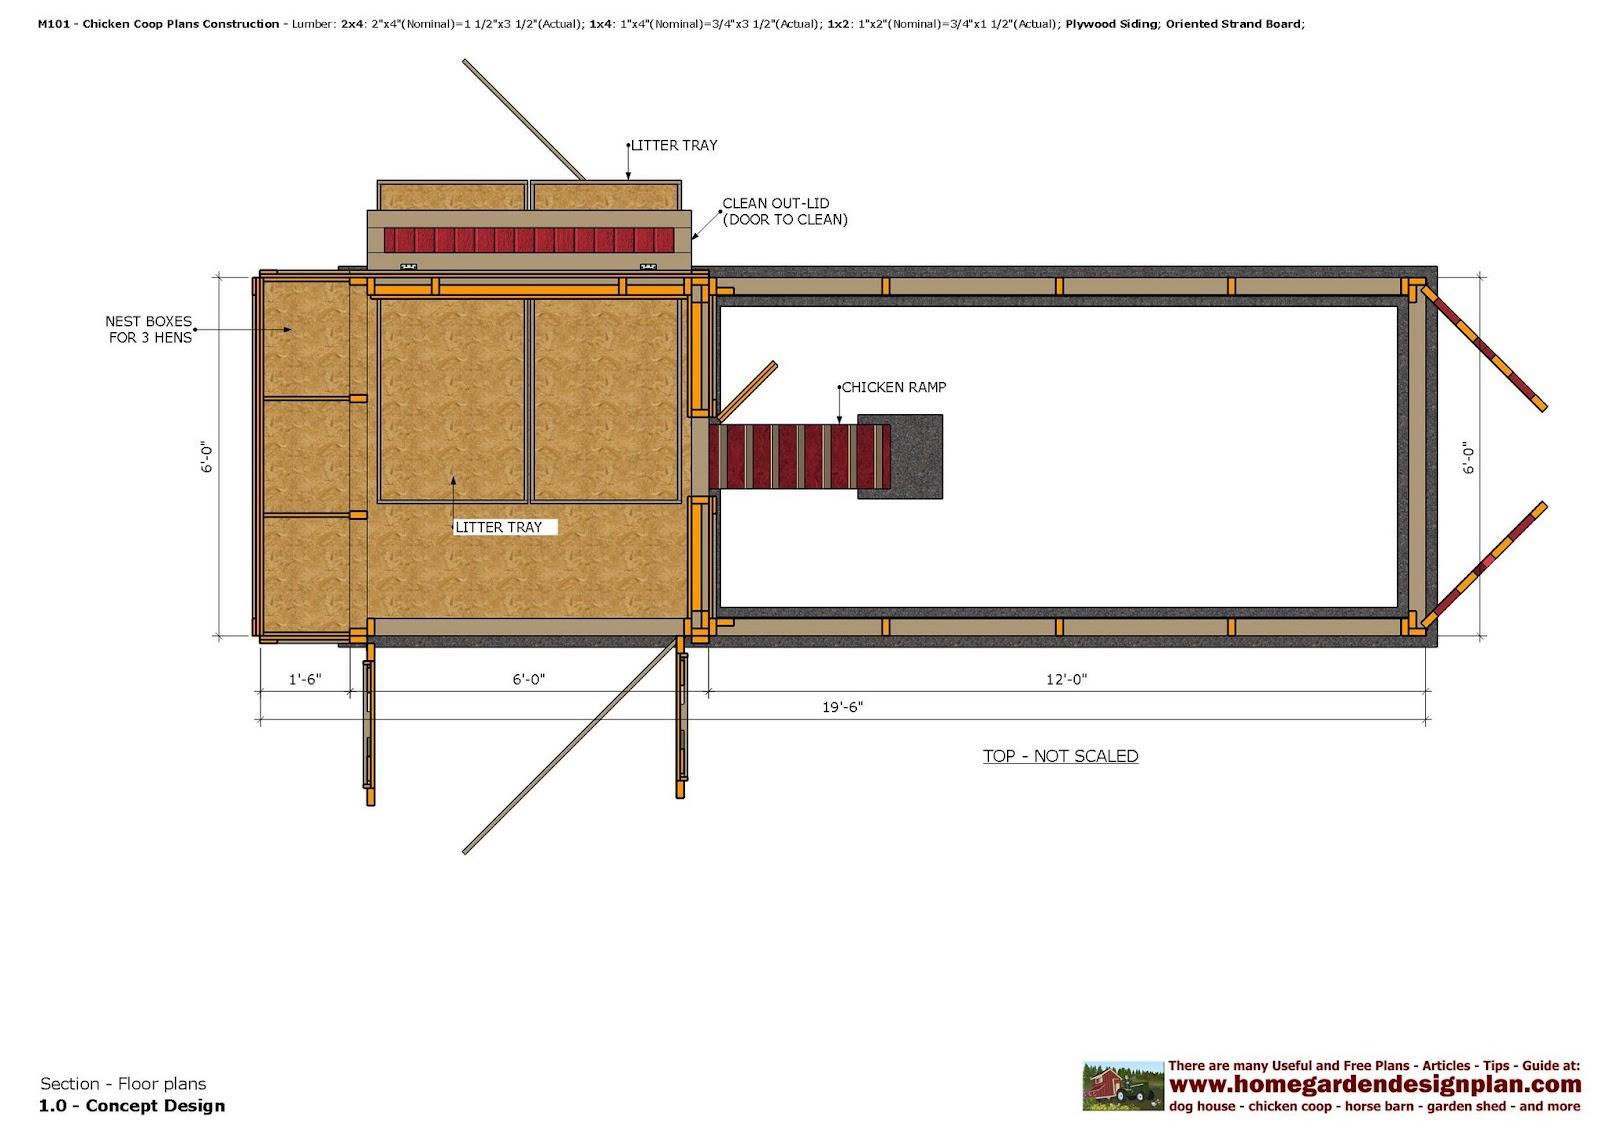 Home garden plans m101 chicken coop plans construction for U build plans